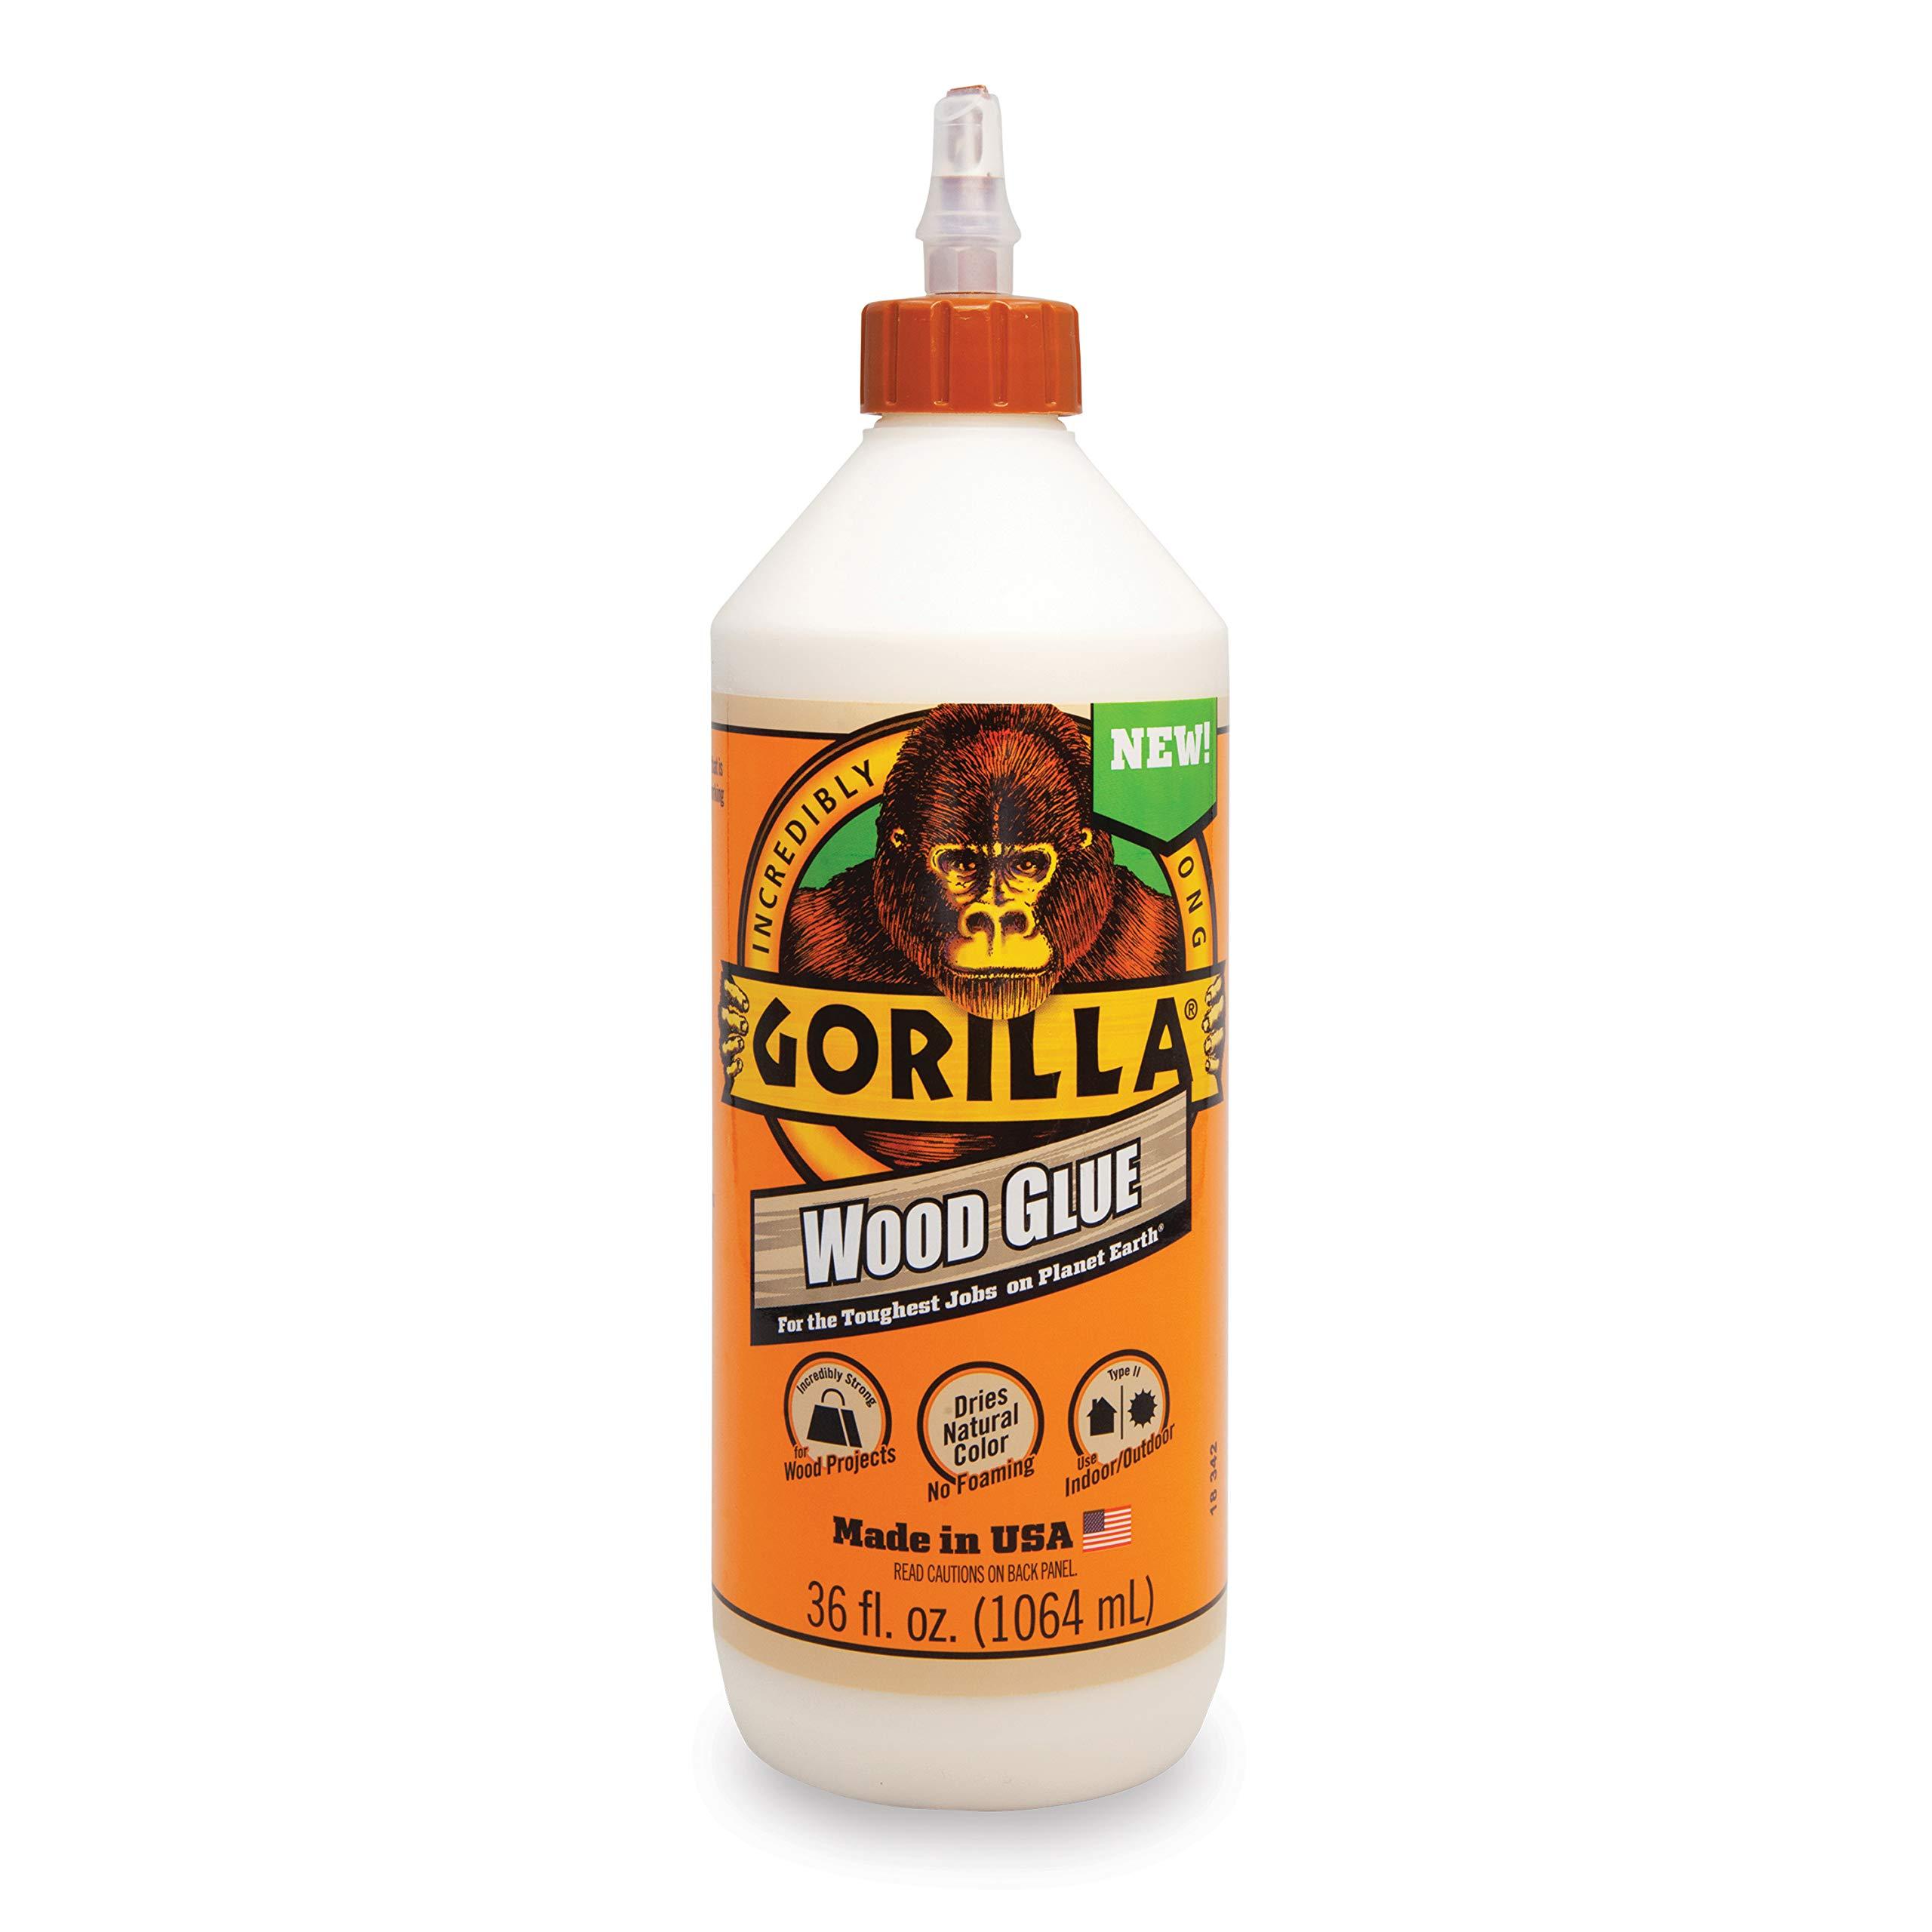 Gorilla 6206005 Wood Glue, 36 ounce Bottle, Natural Wood Color, (Pack of 1)